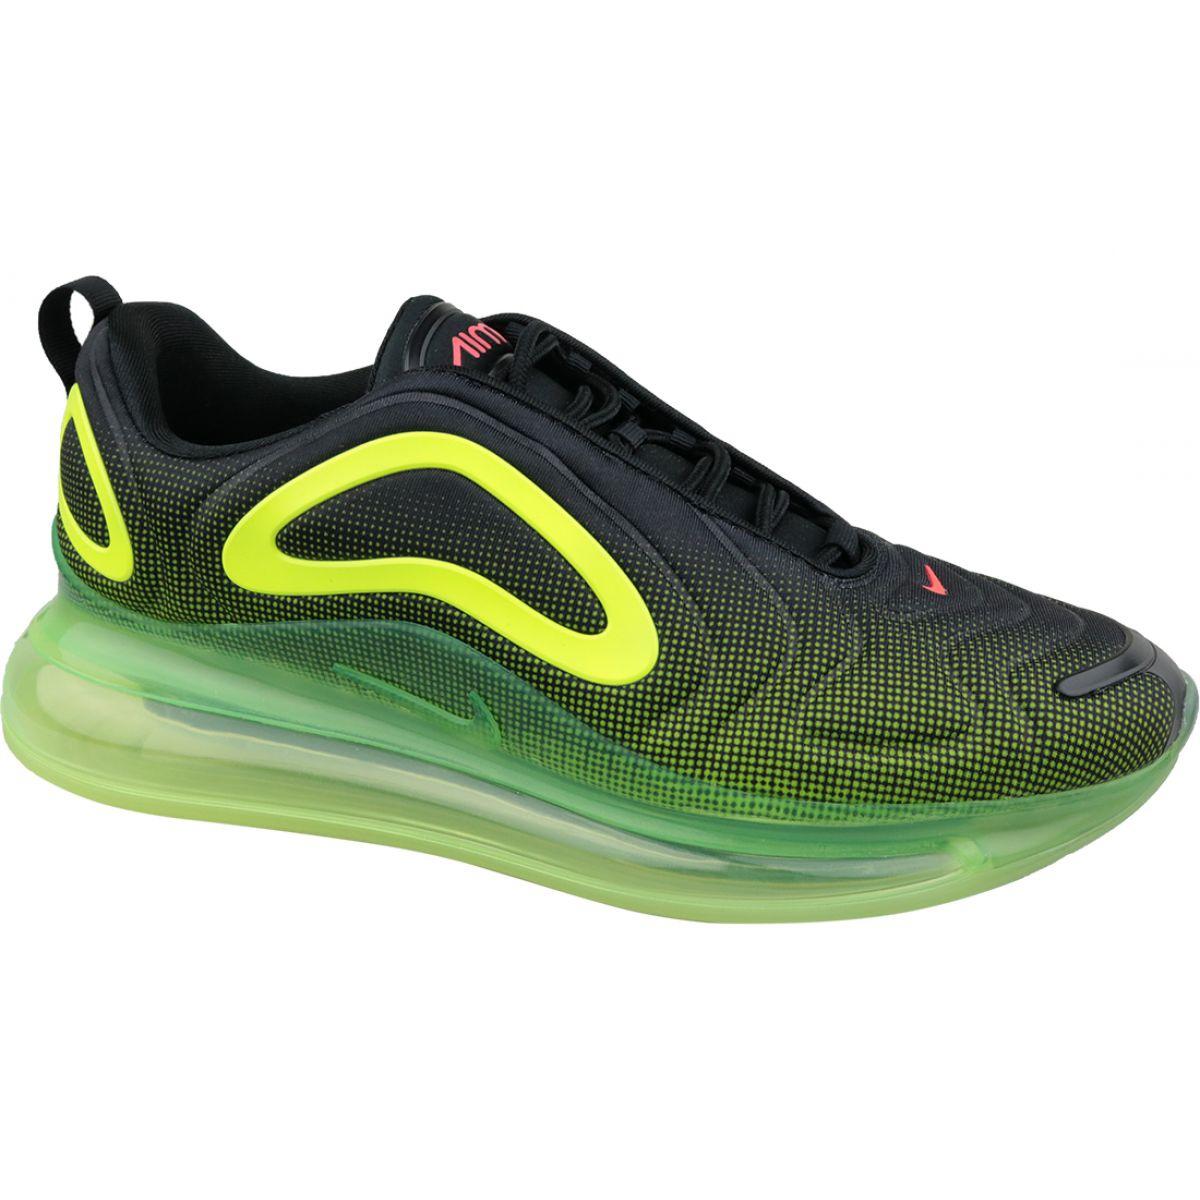 Greenglacier 0 W Air Black 2 Nike White Bei Ultra Blue Max